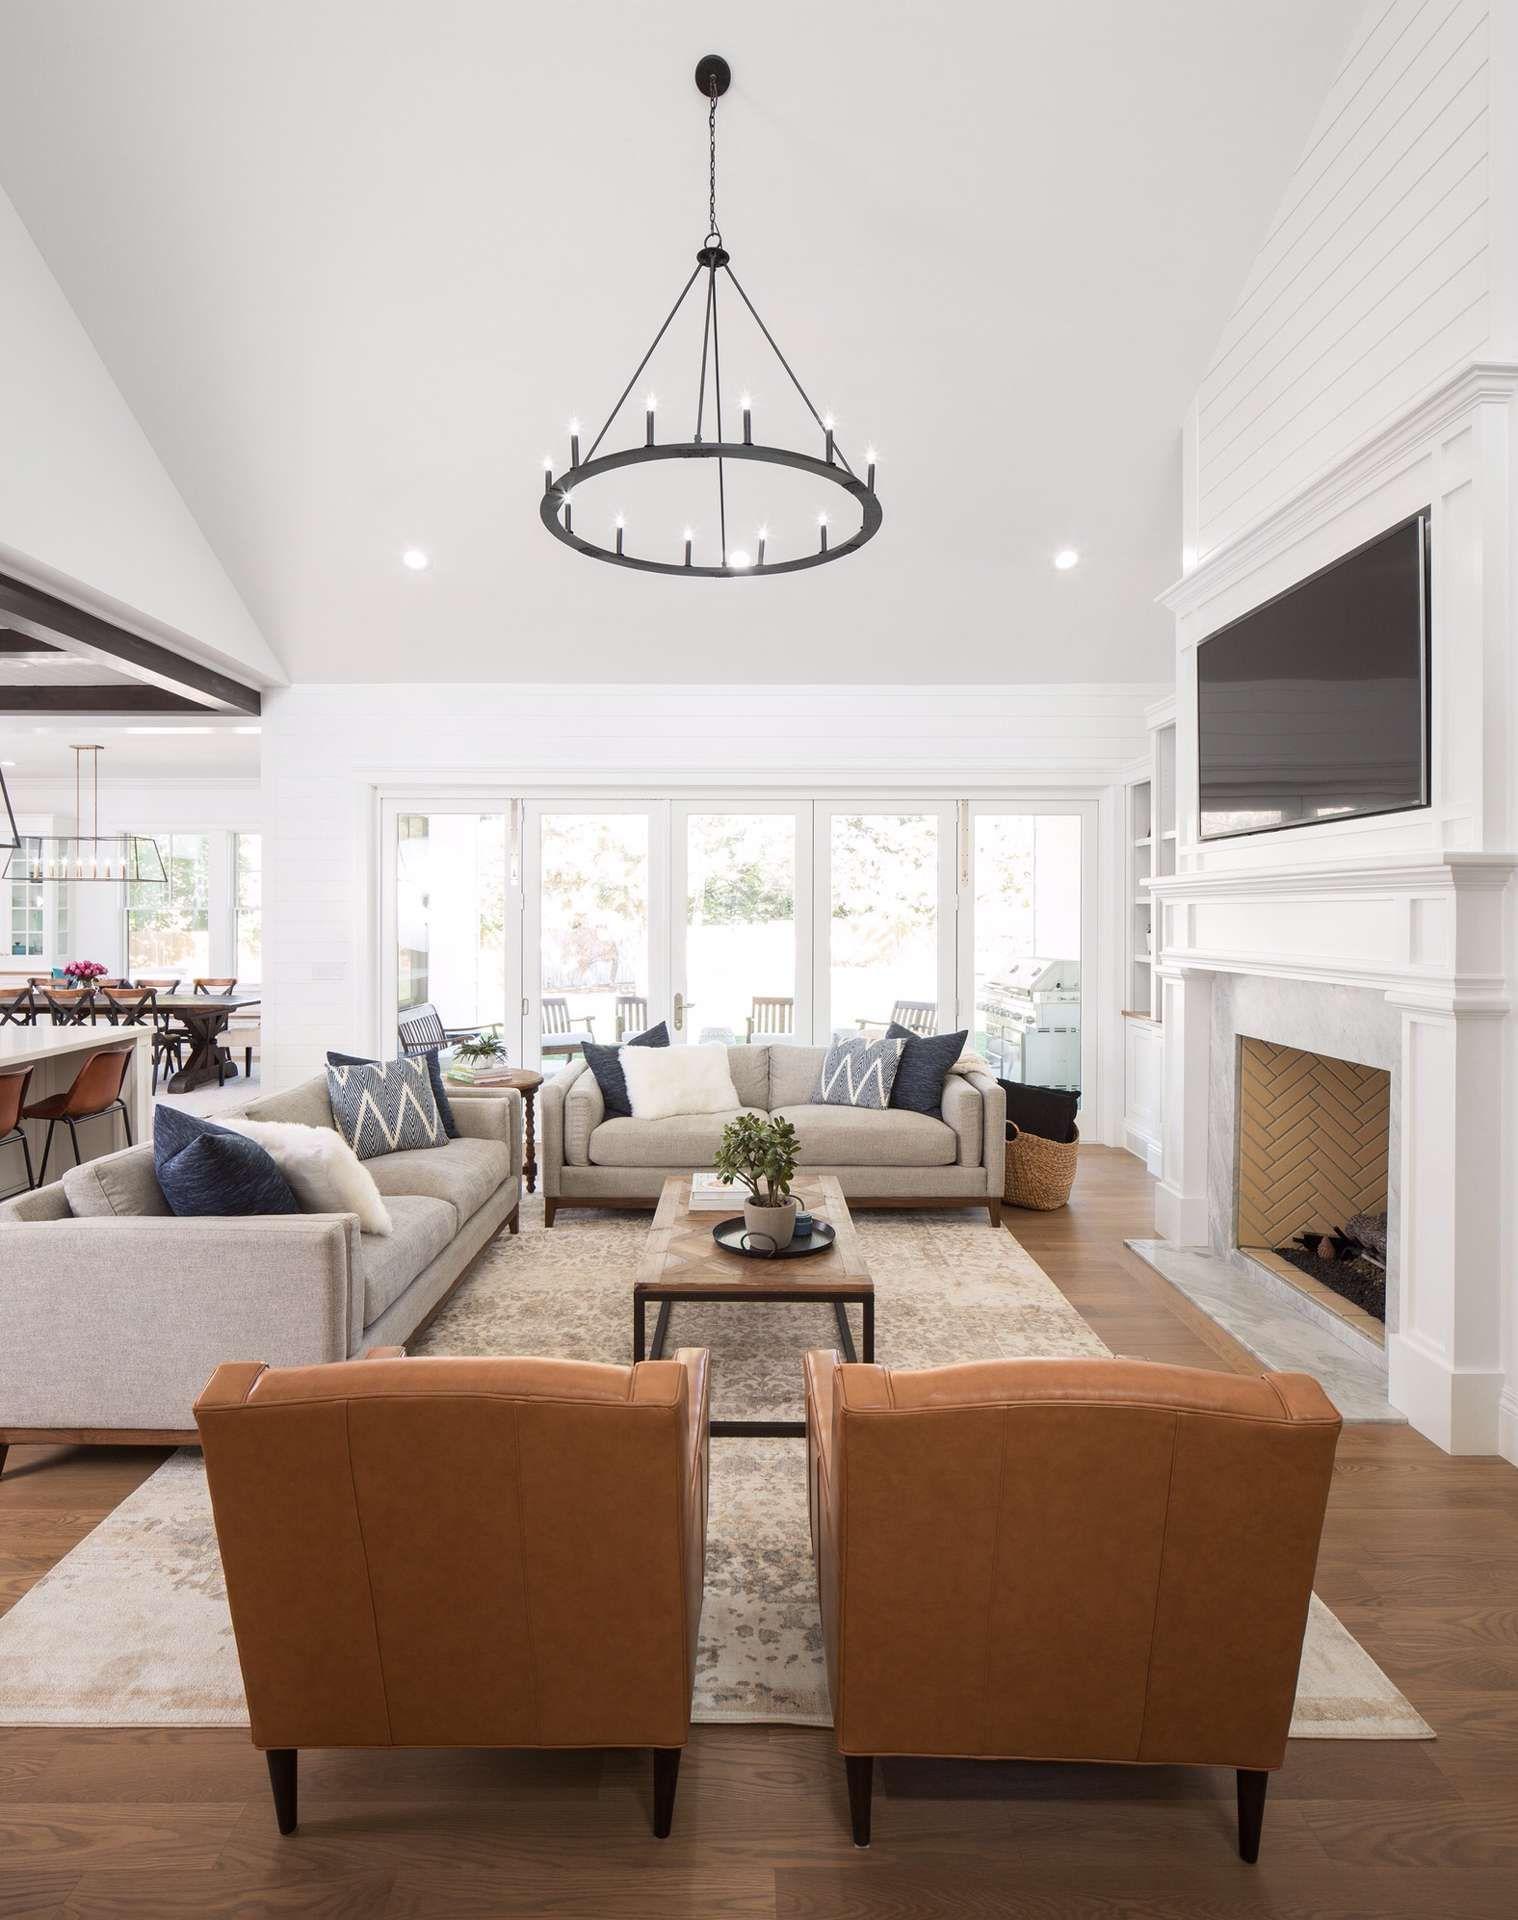 35 Living Room Ideas 2016: 35 The Best Rustic Farmhouse Living Room Decor Ideas